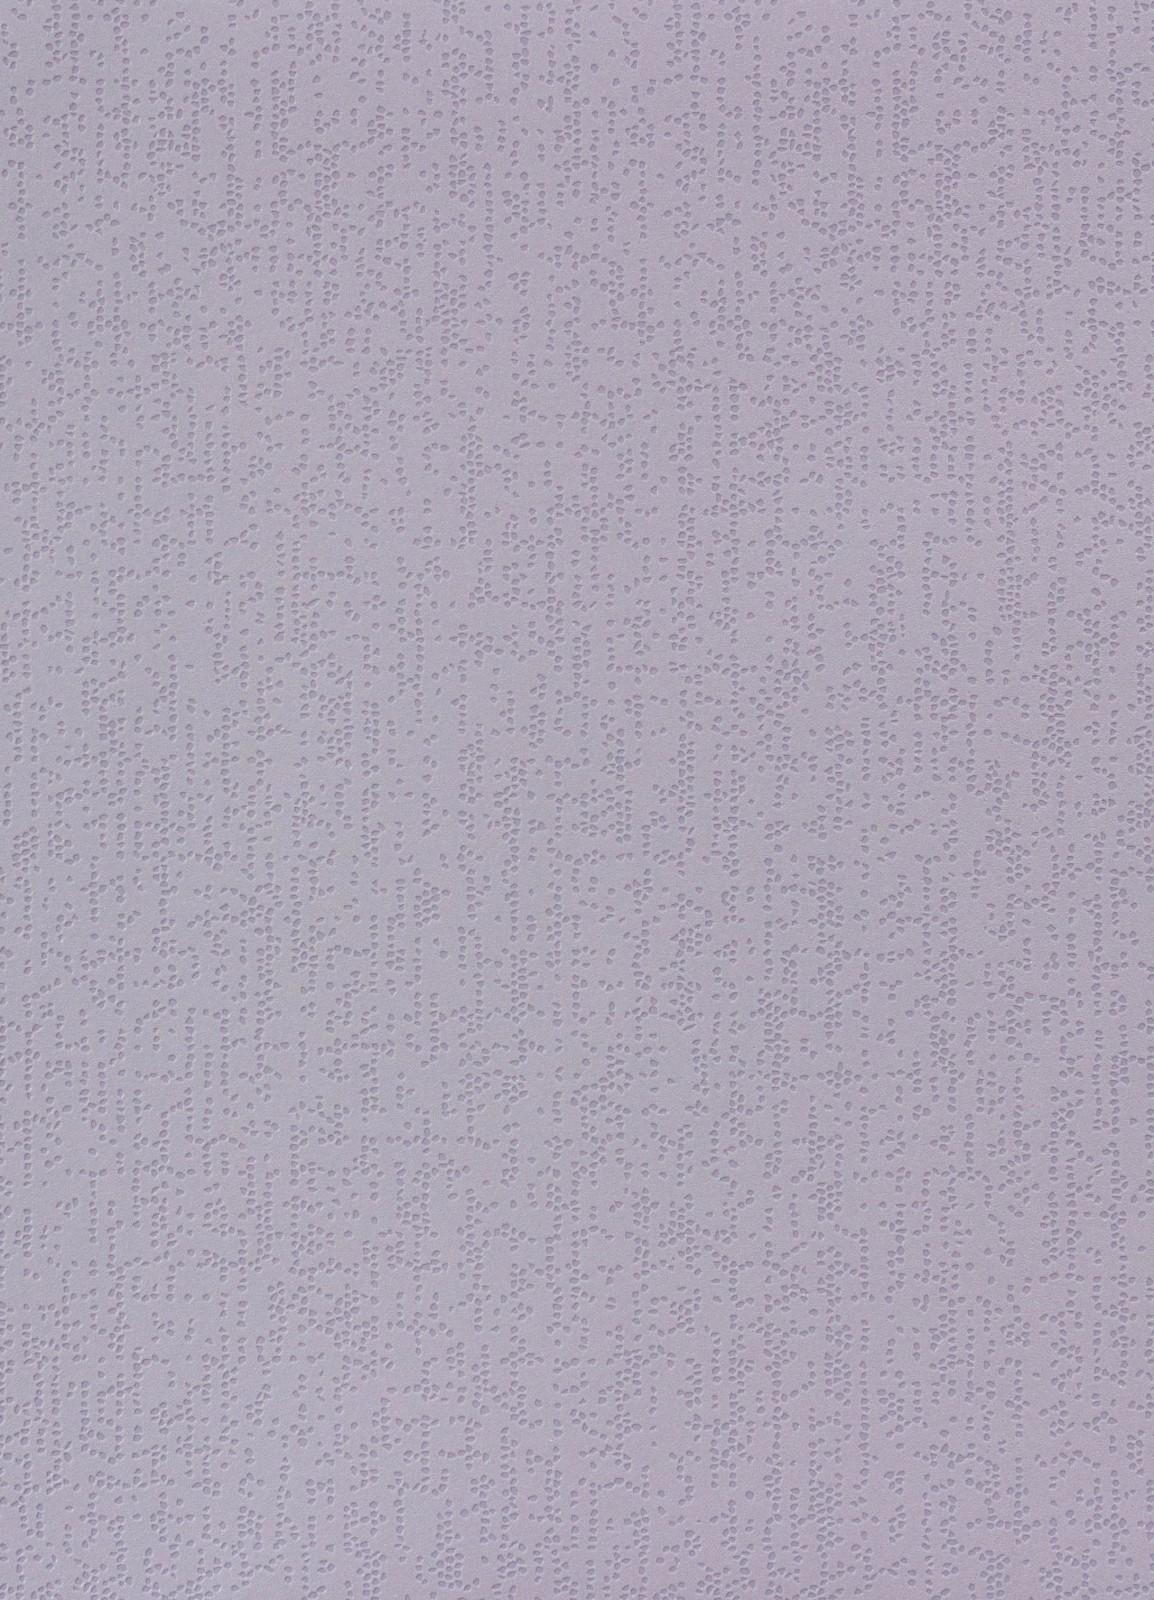 Esprit Tapeten Neue Kollektion : Tapete ESPRIT HOME 8 Vliestapete 3047-42 304742 Uni lila flieder